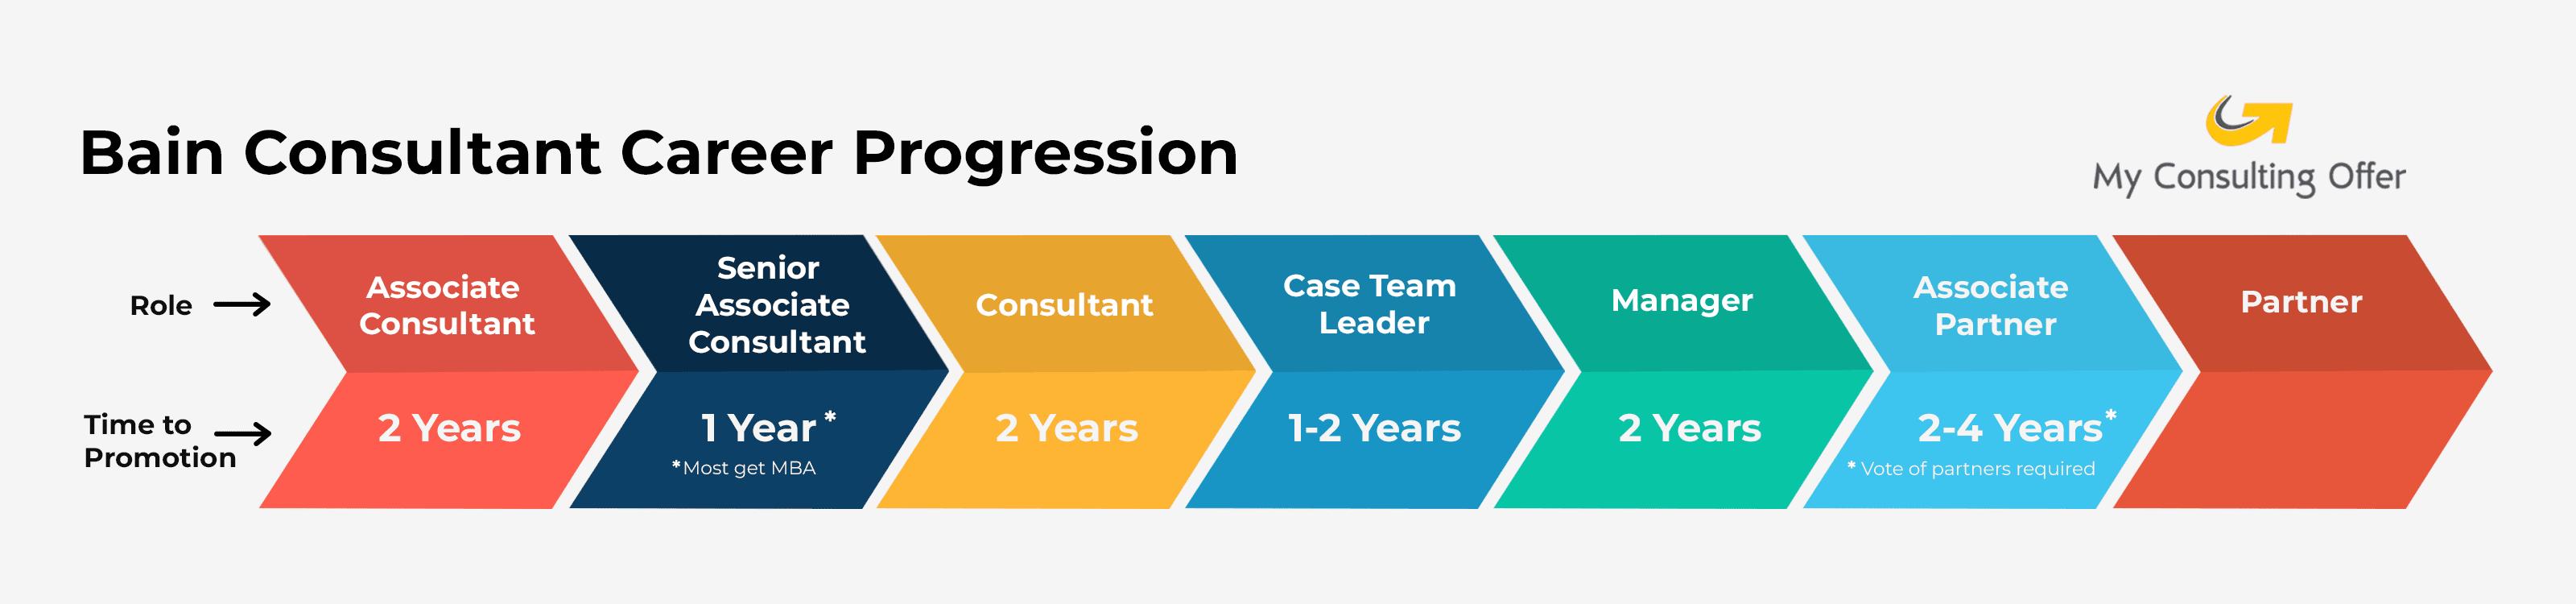 Bain-Consultant-Career-Progression